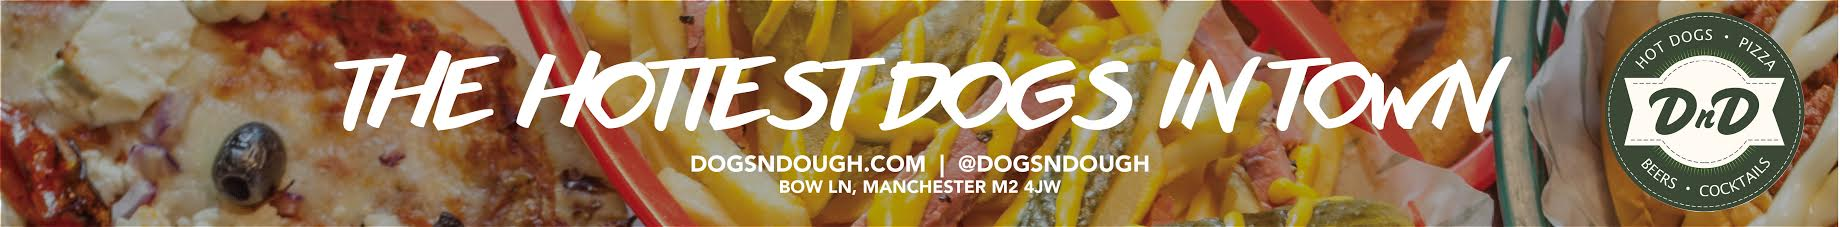 Dogs n Dough